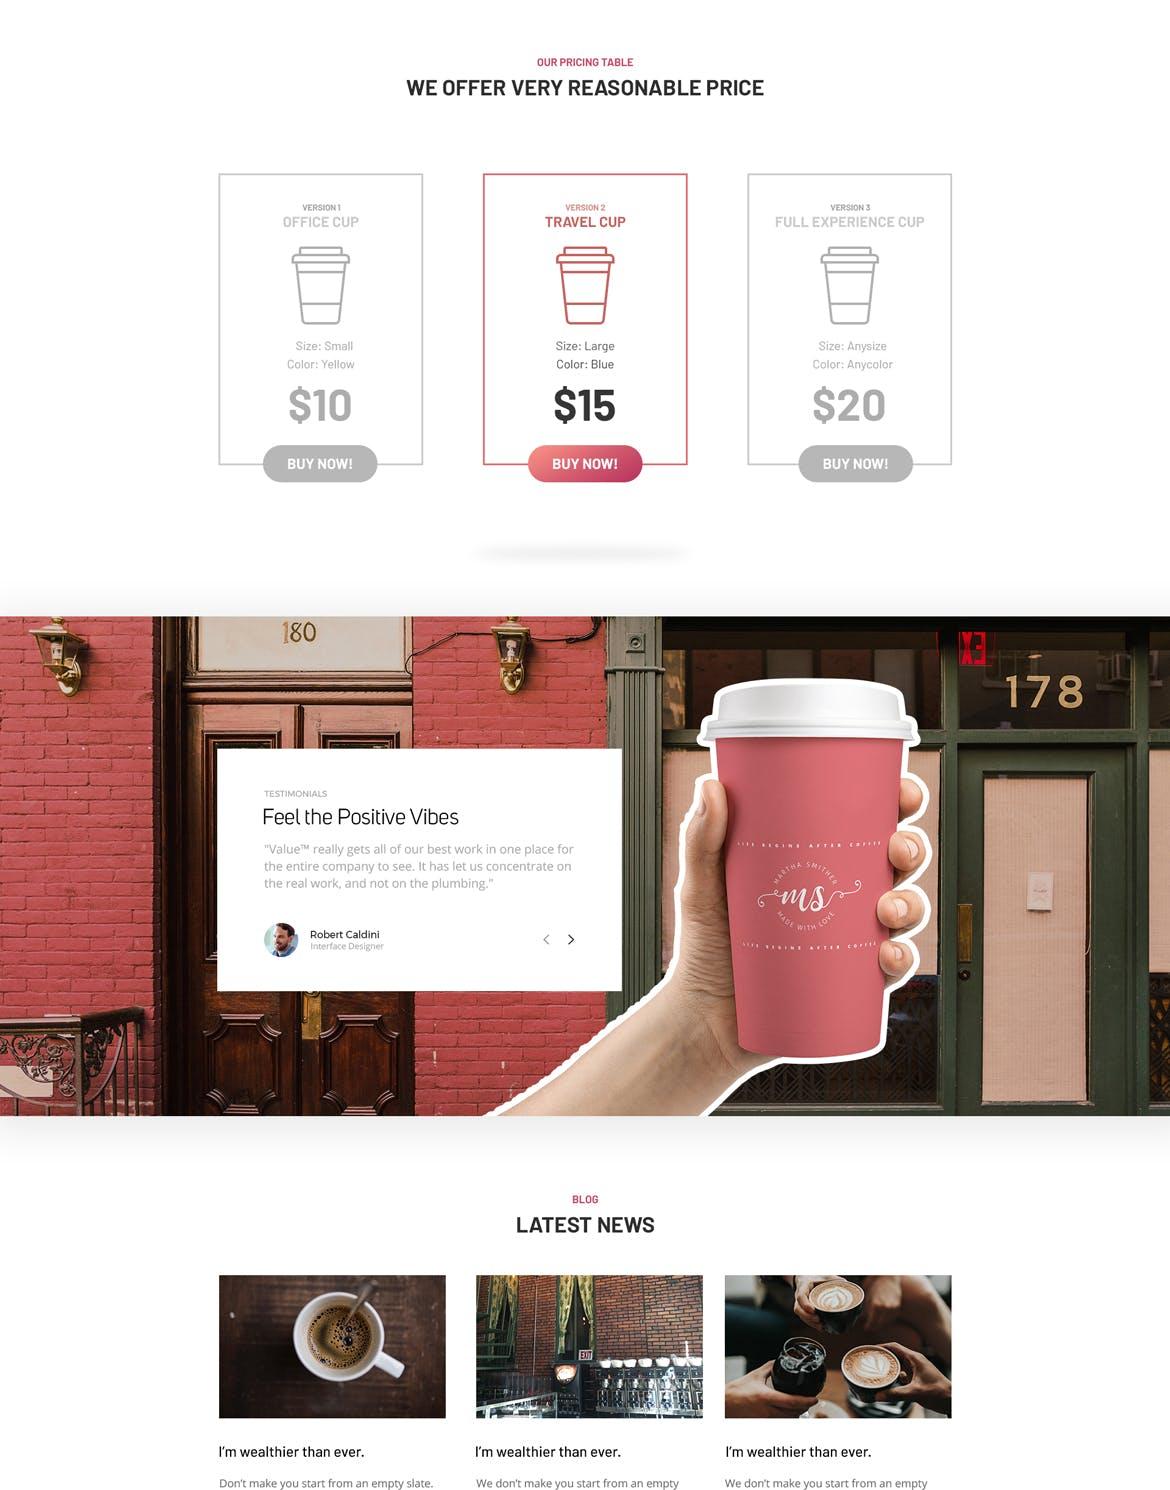 热饮杯咖啡产品系列介绍页  样机模板The Mug Creative Single Product Template Design